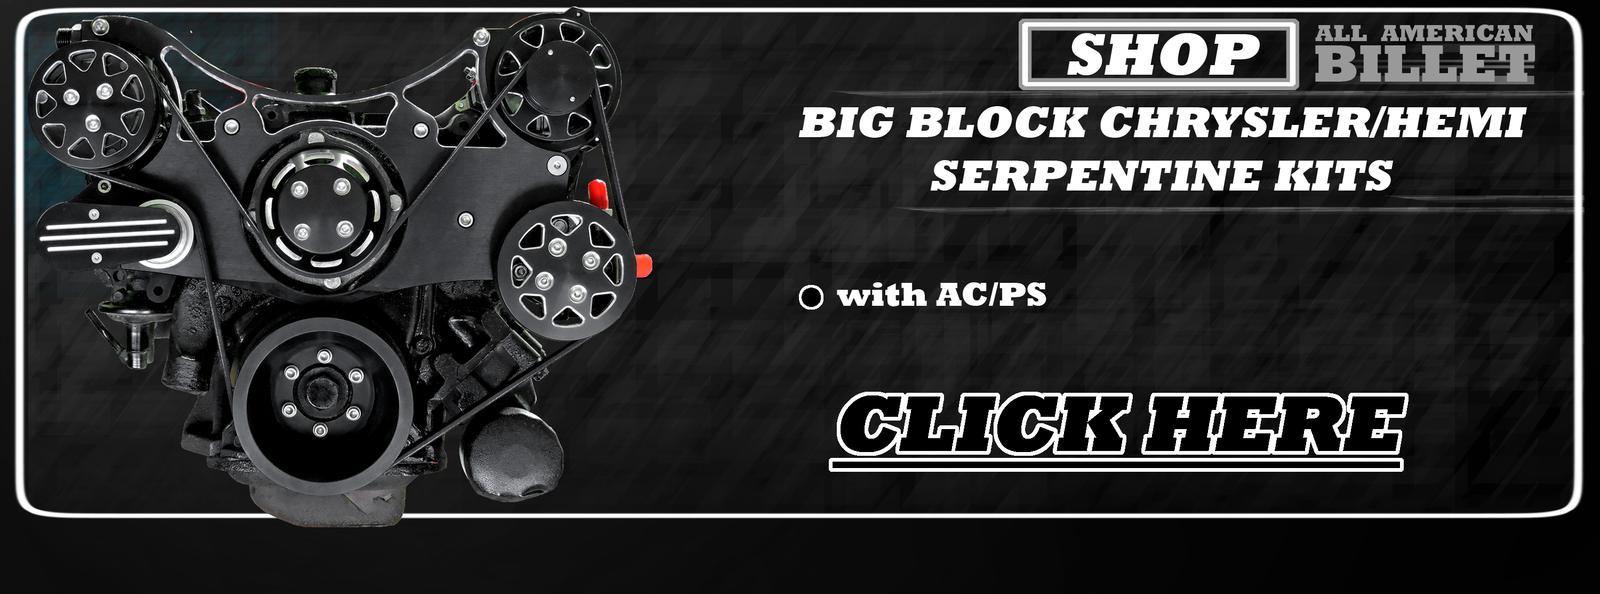 Shop 440 Button Click Here